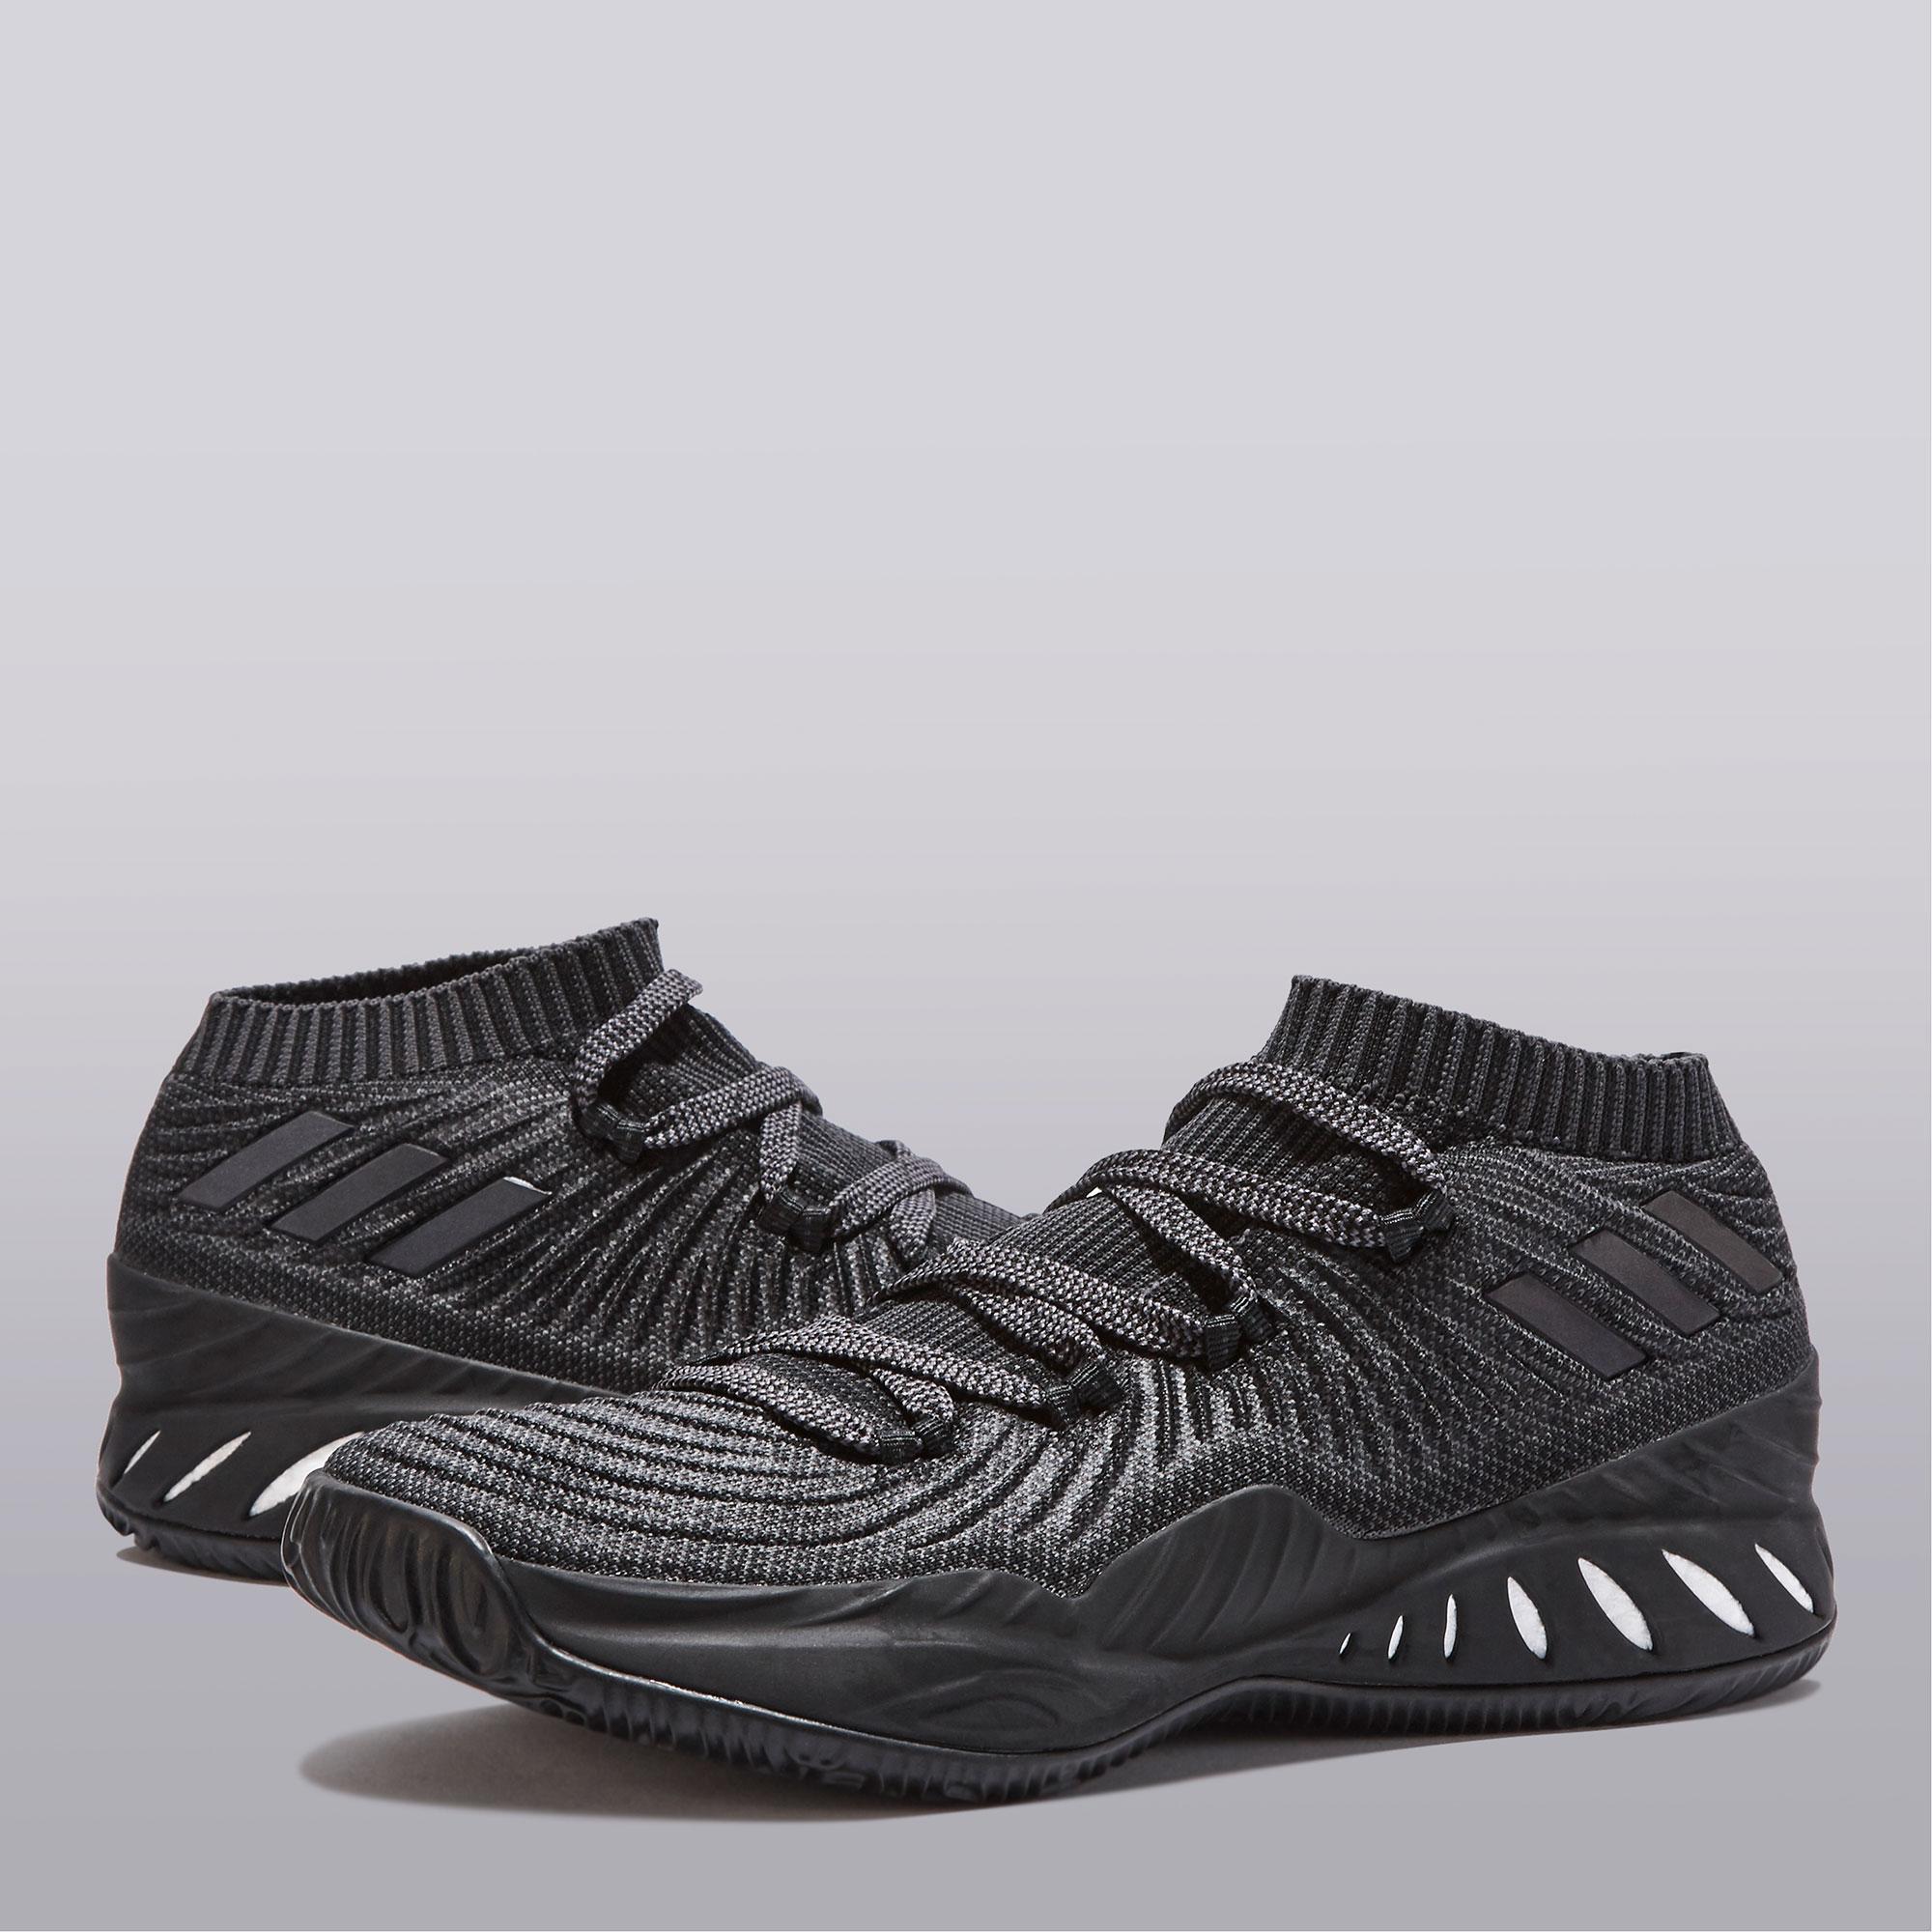 "Image of ""adidas Crazy Explosive Low Primeknit 2017 Basketball Shoe - Triple Black"""